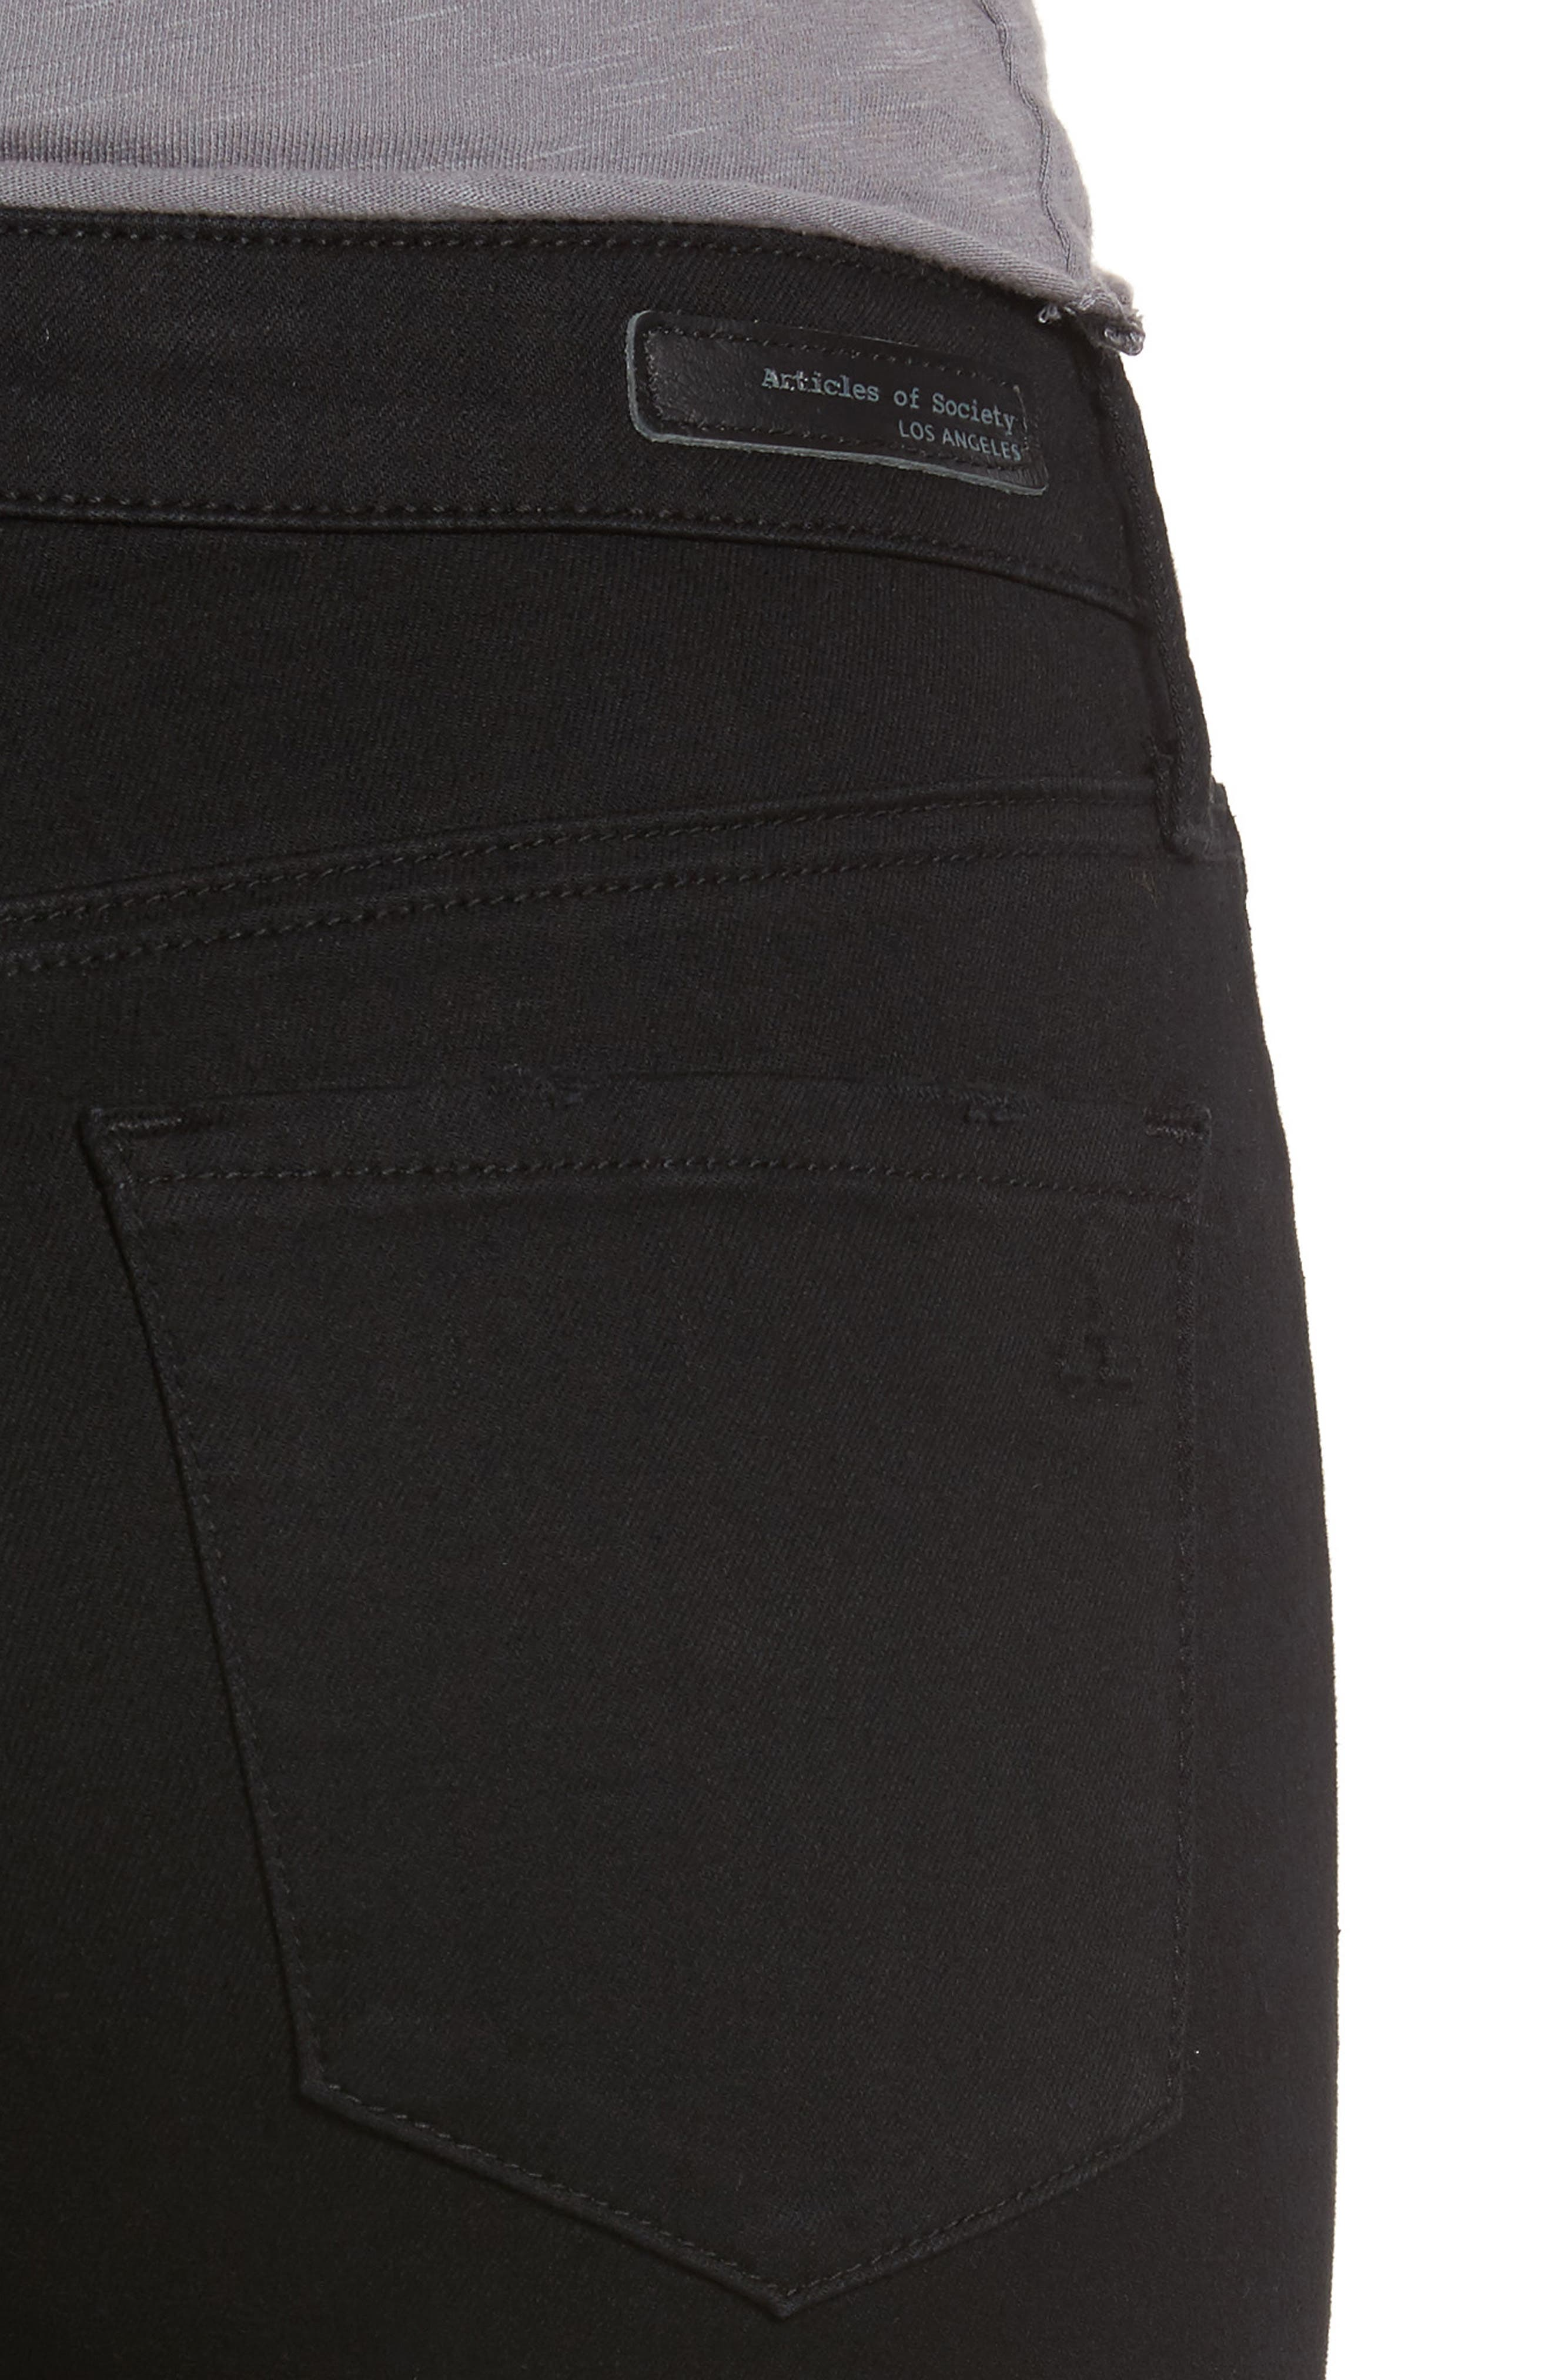 Sarah Skinny Jeans,                             Alternate thumbnail 4, color,                             001